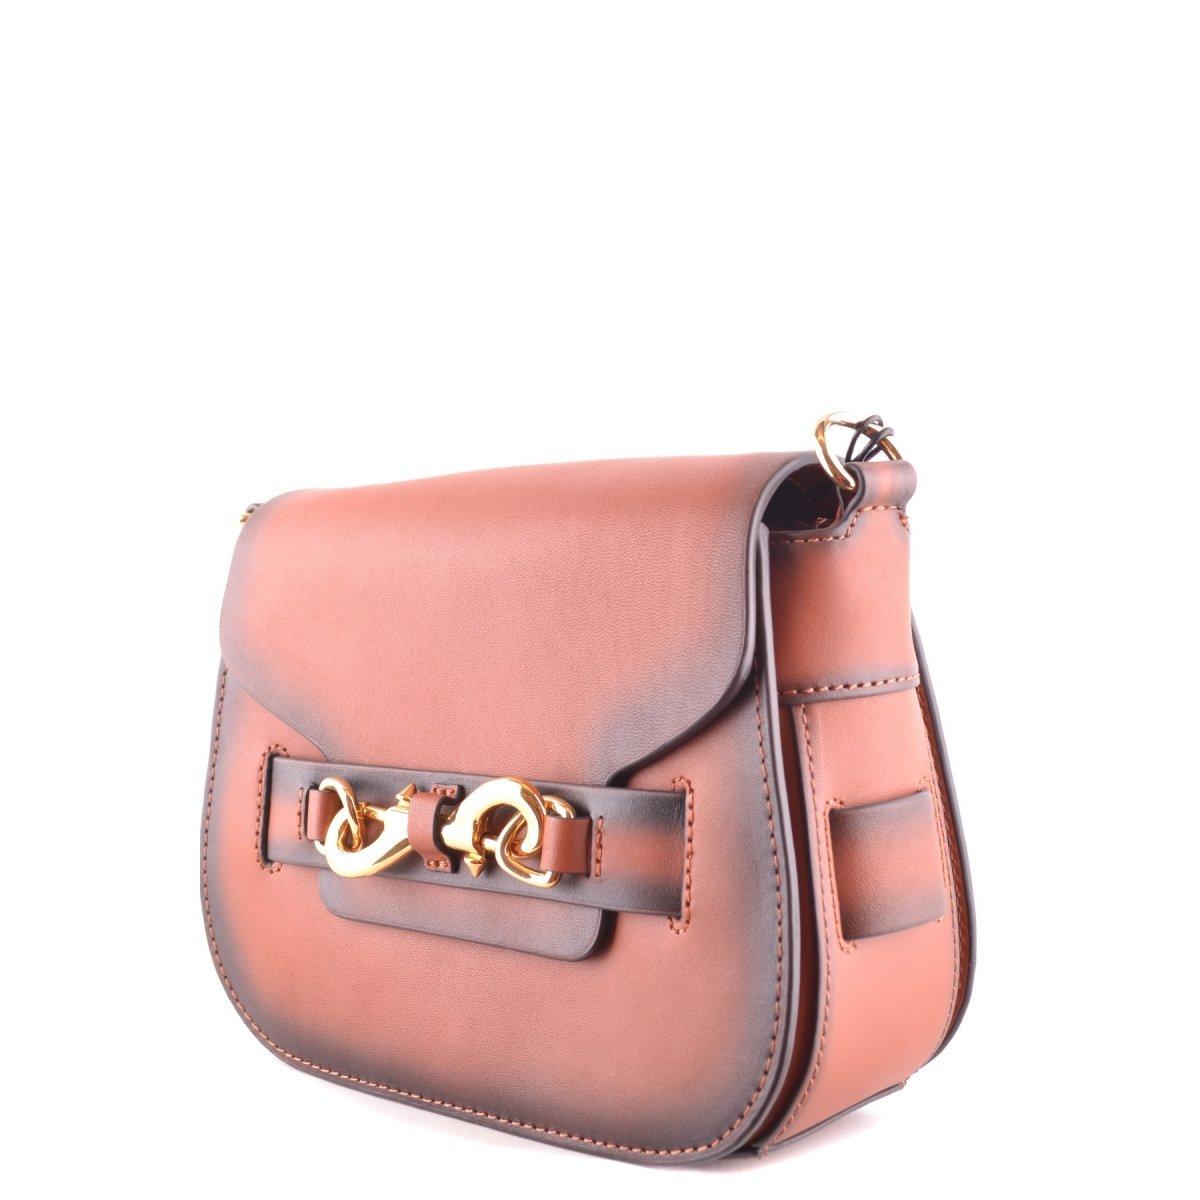 Amazon.com: Rebecca Minkoff Florencia de la mujer bolsa para ...